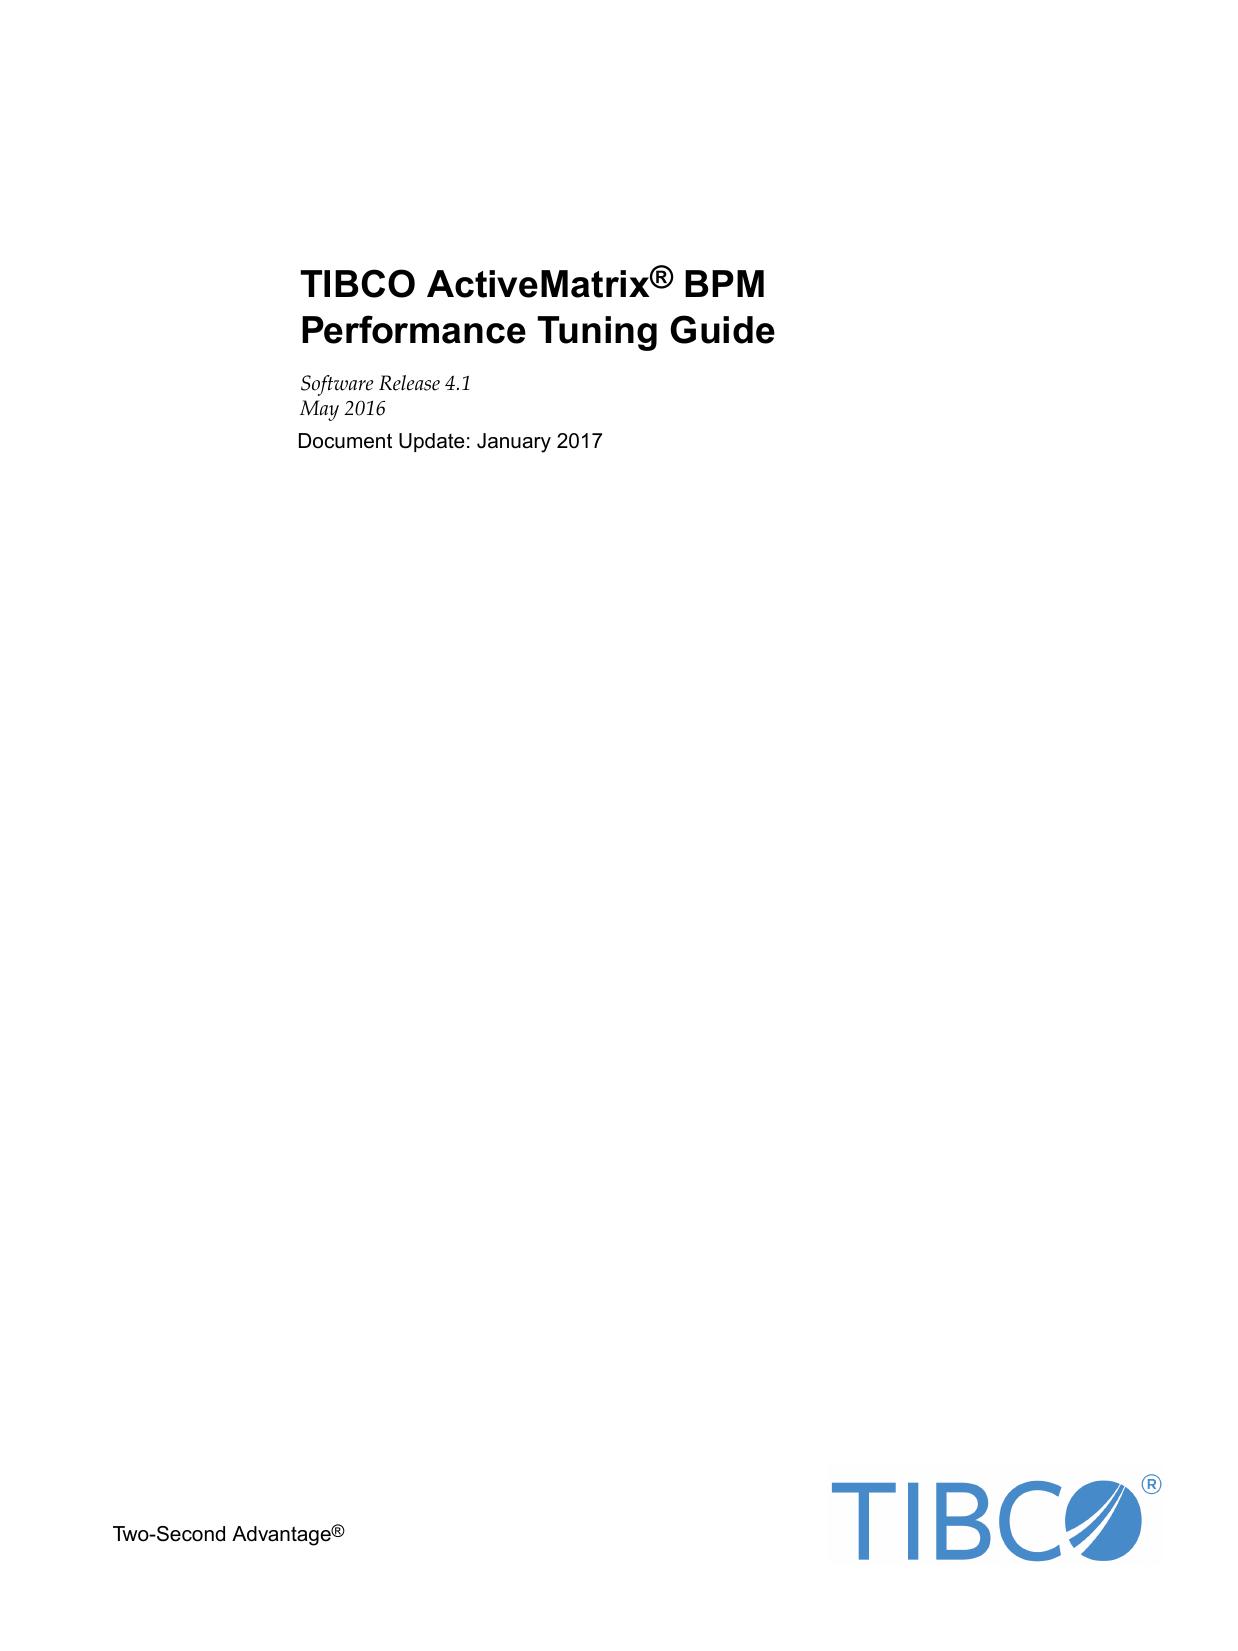 TIBCO ActiveMatrix® BPM Performance Tuning Guide | manualzz com